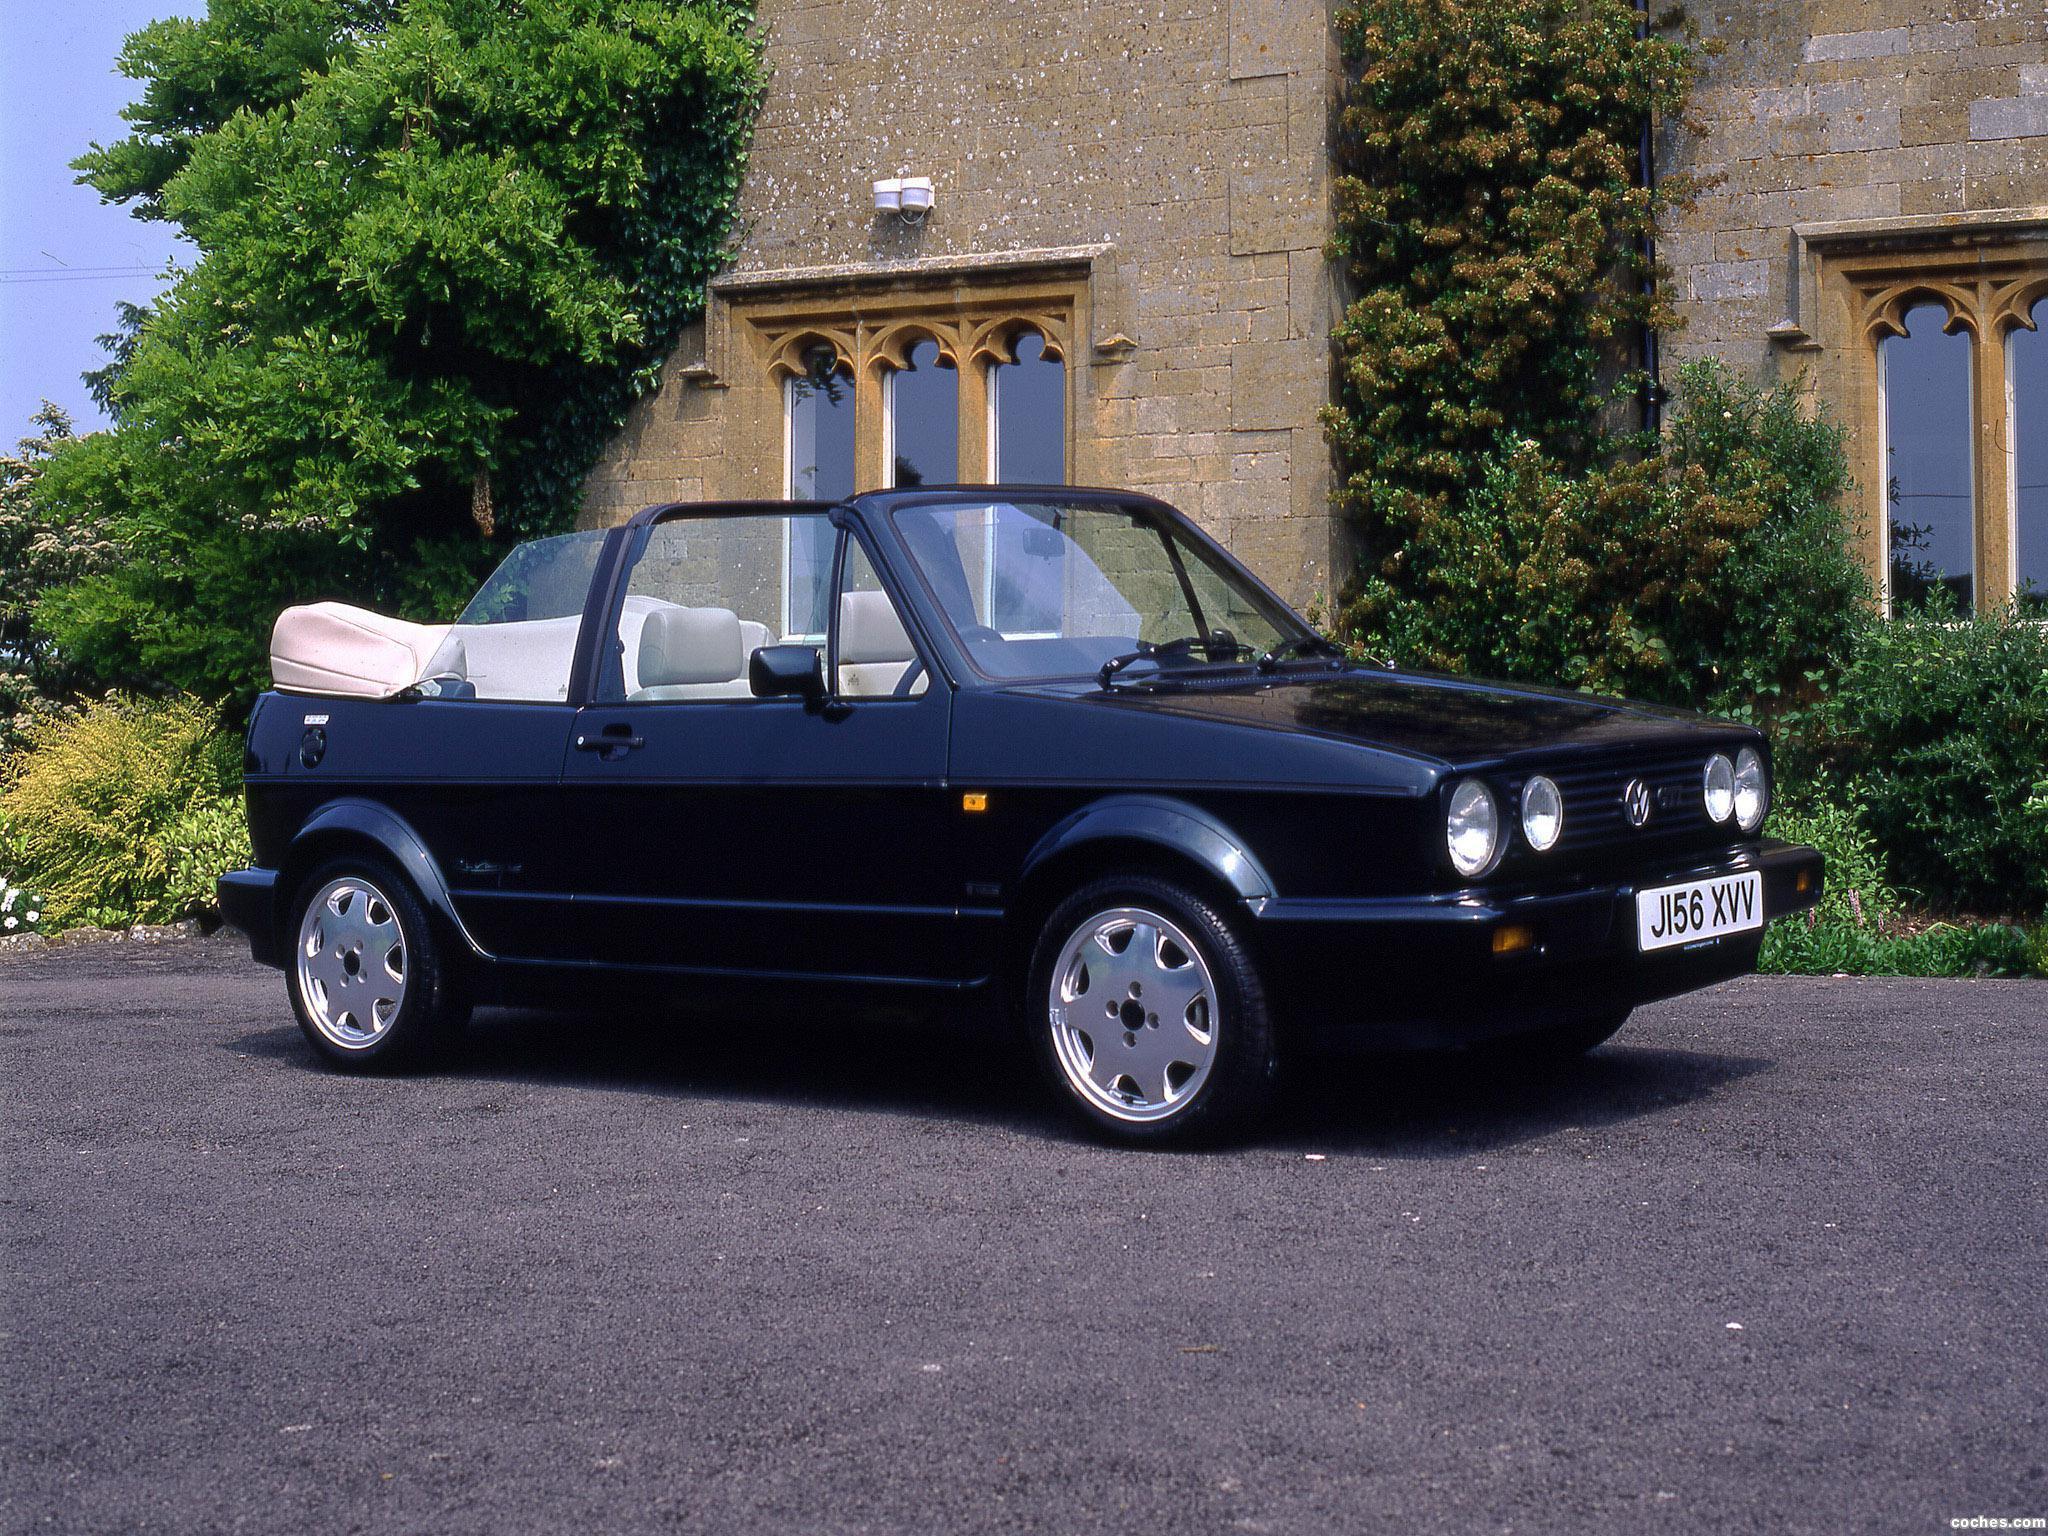 volkswagen_golf-cabrio-uk-1988-93_r1.jpg